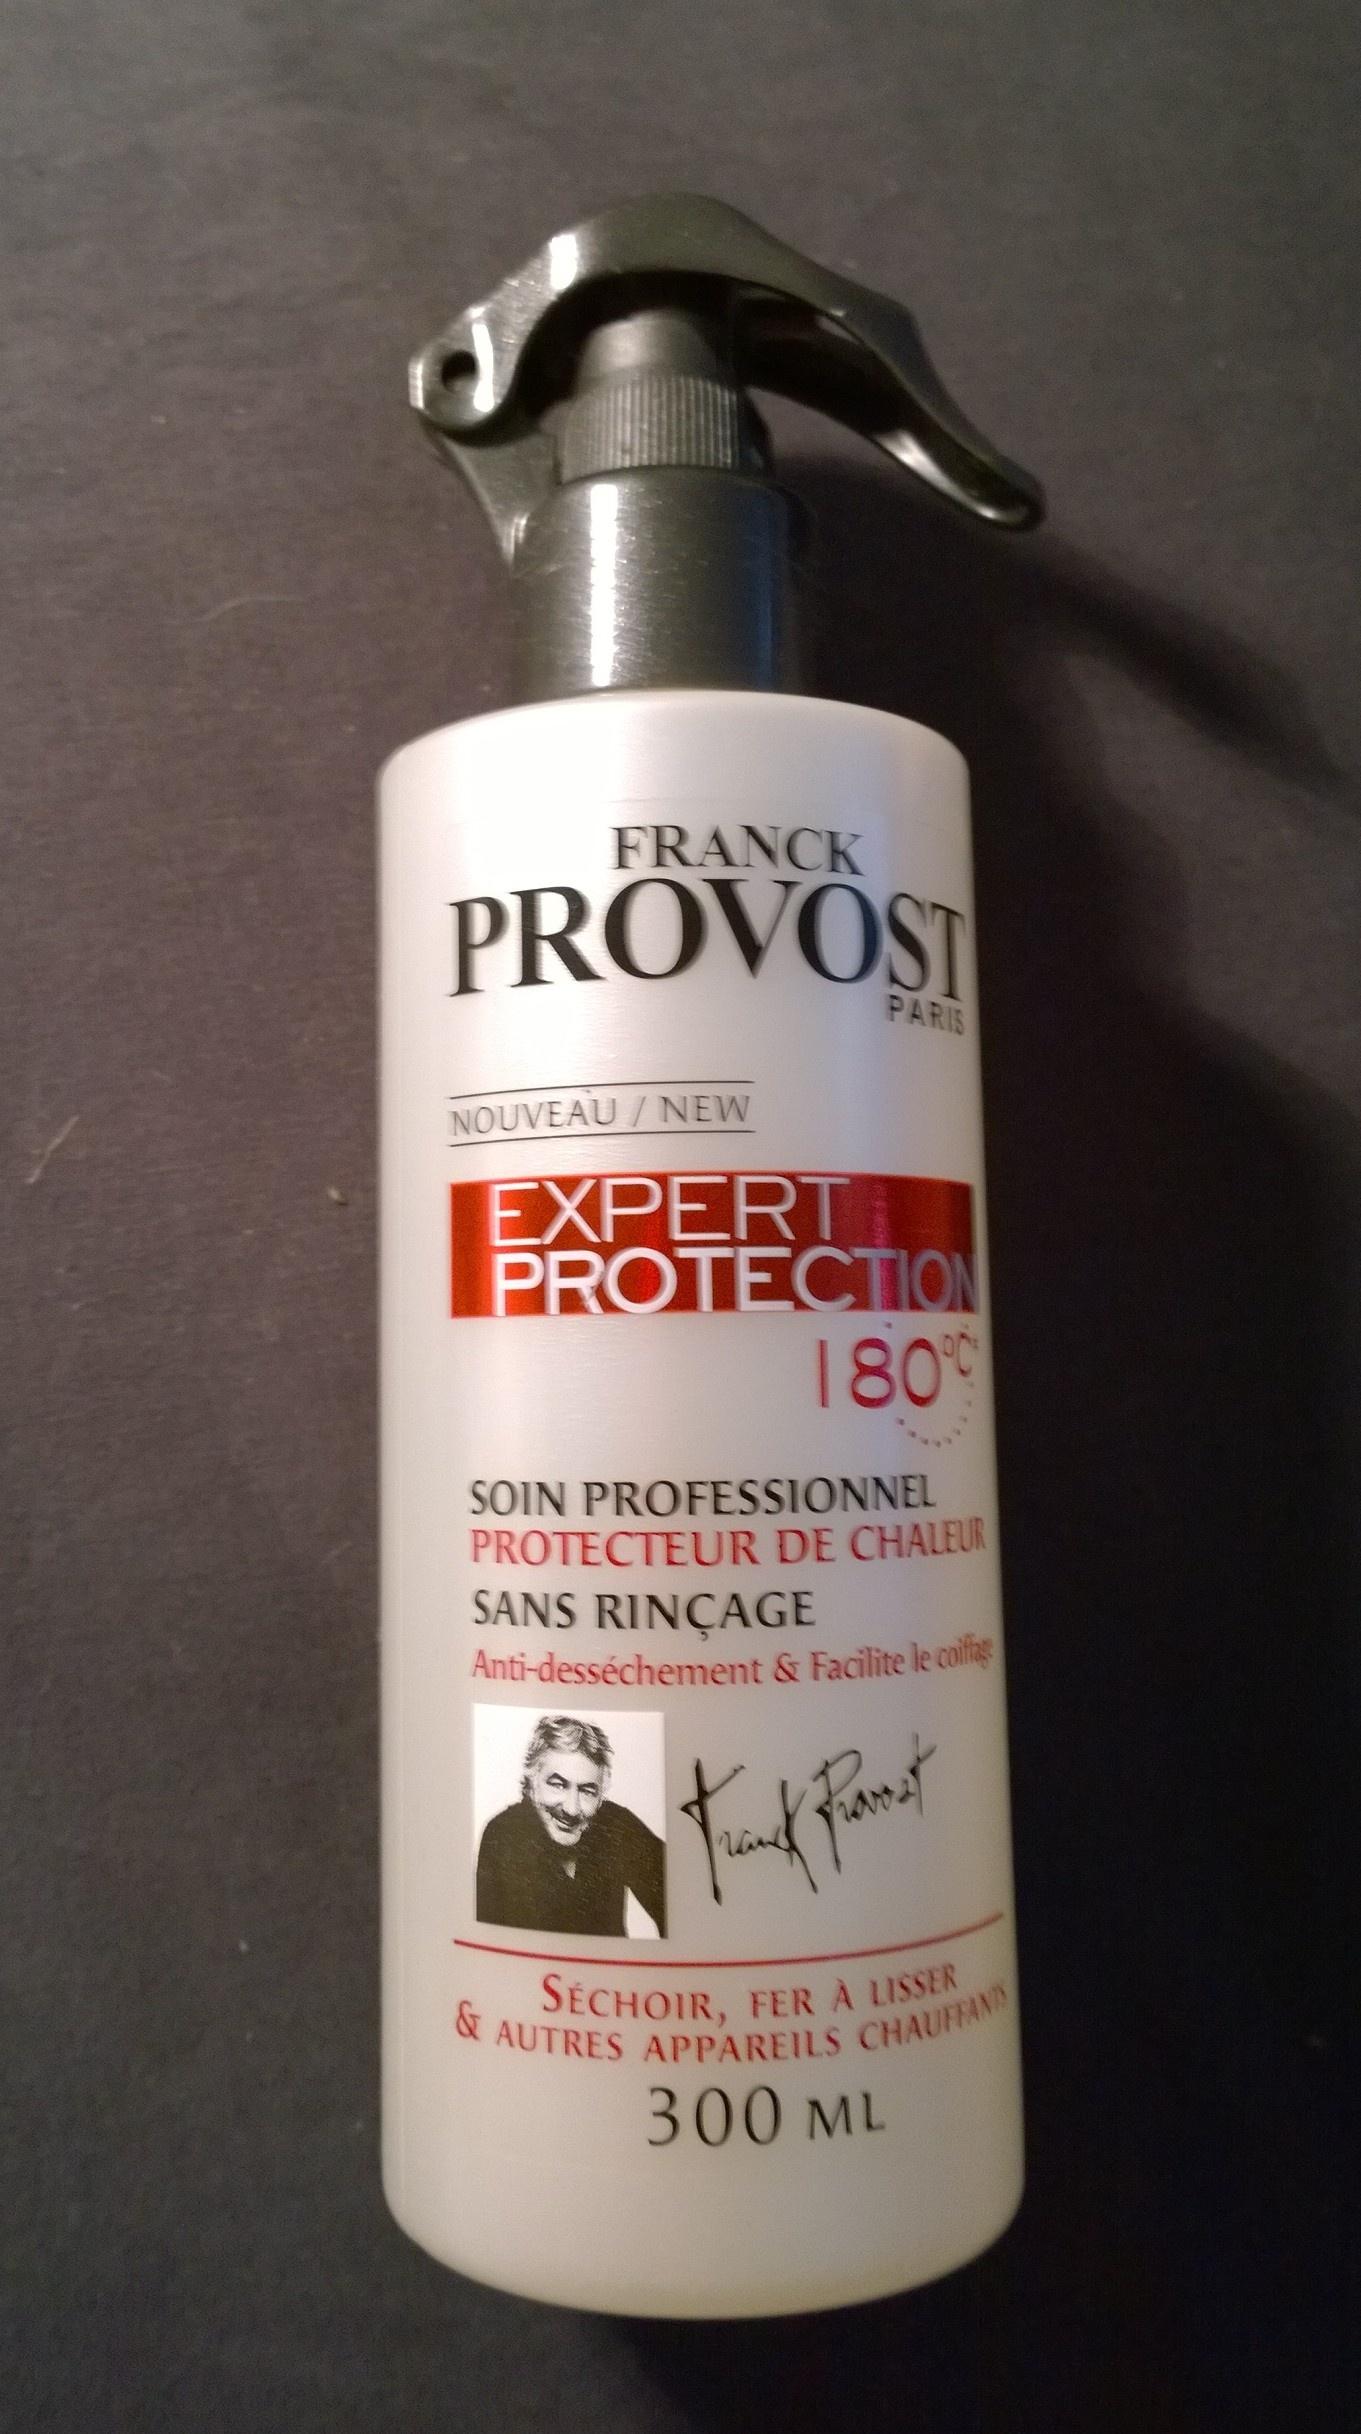 Expert Protection - Soin Professionnel de Franck Provost